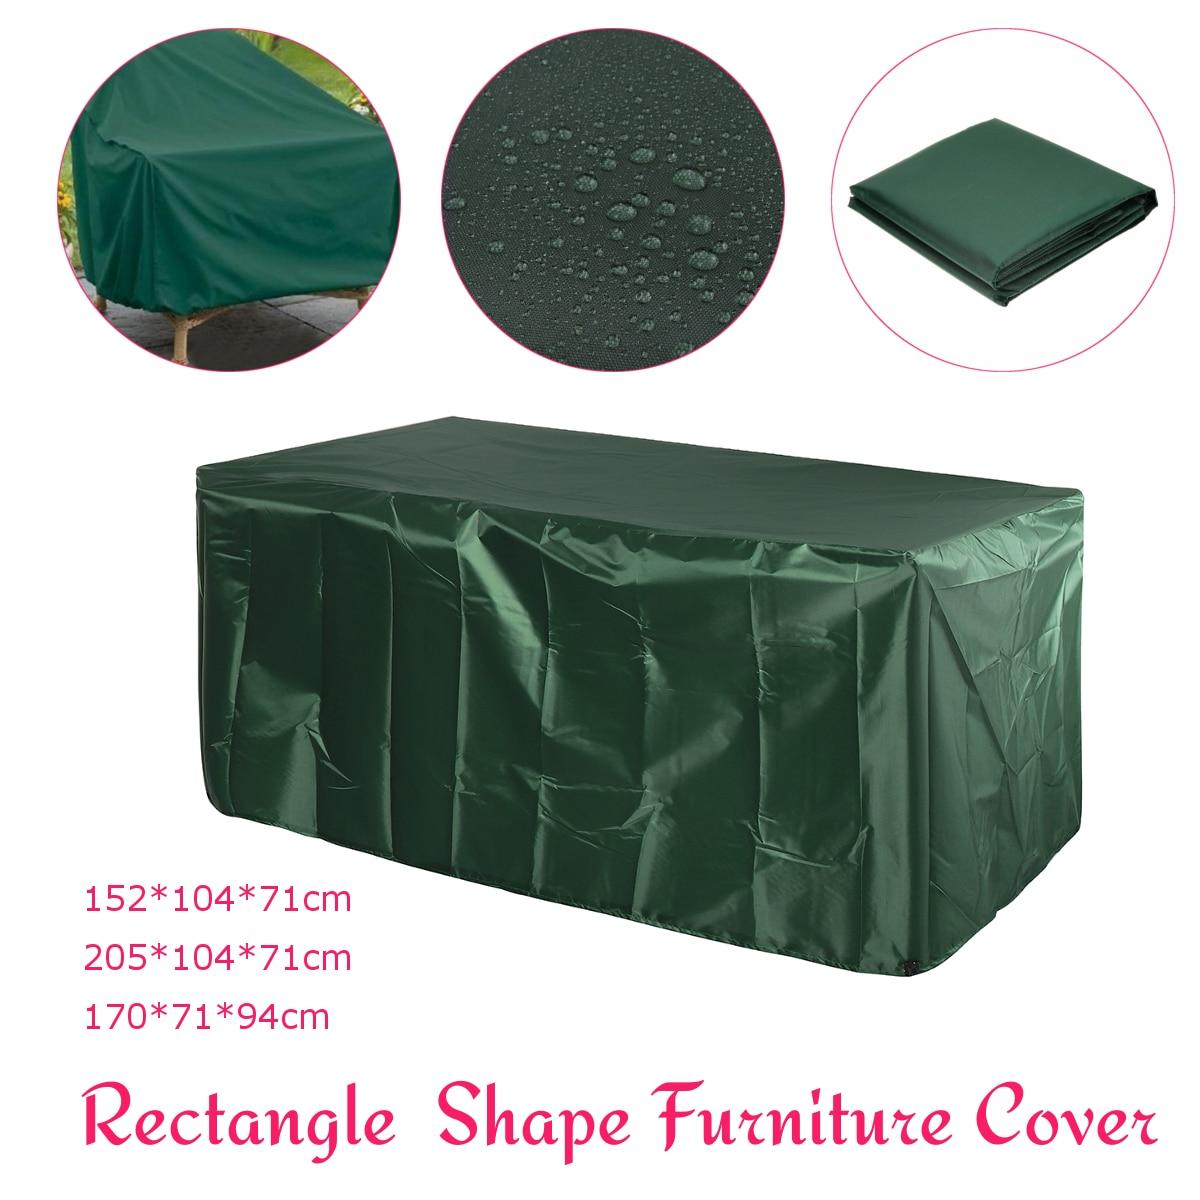 Waterproof Outdoor Garden Patio Furniture Cover Set Table Sofa Bench Wicker Sofa Set Protection Rain Snow Dustproof Covers